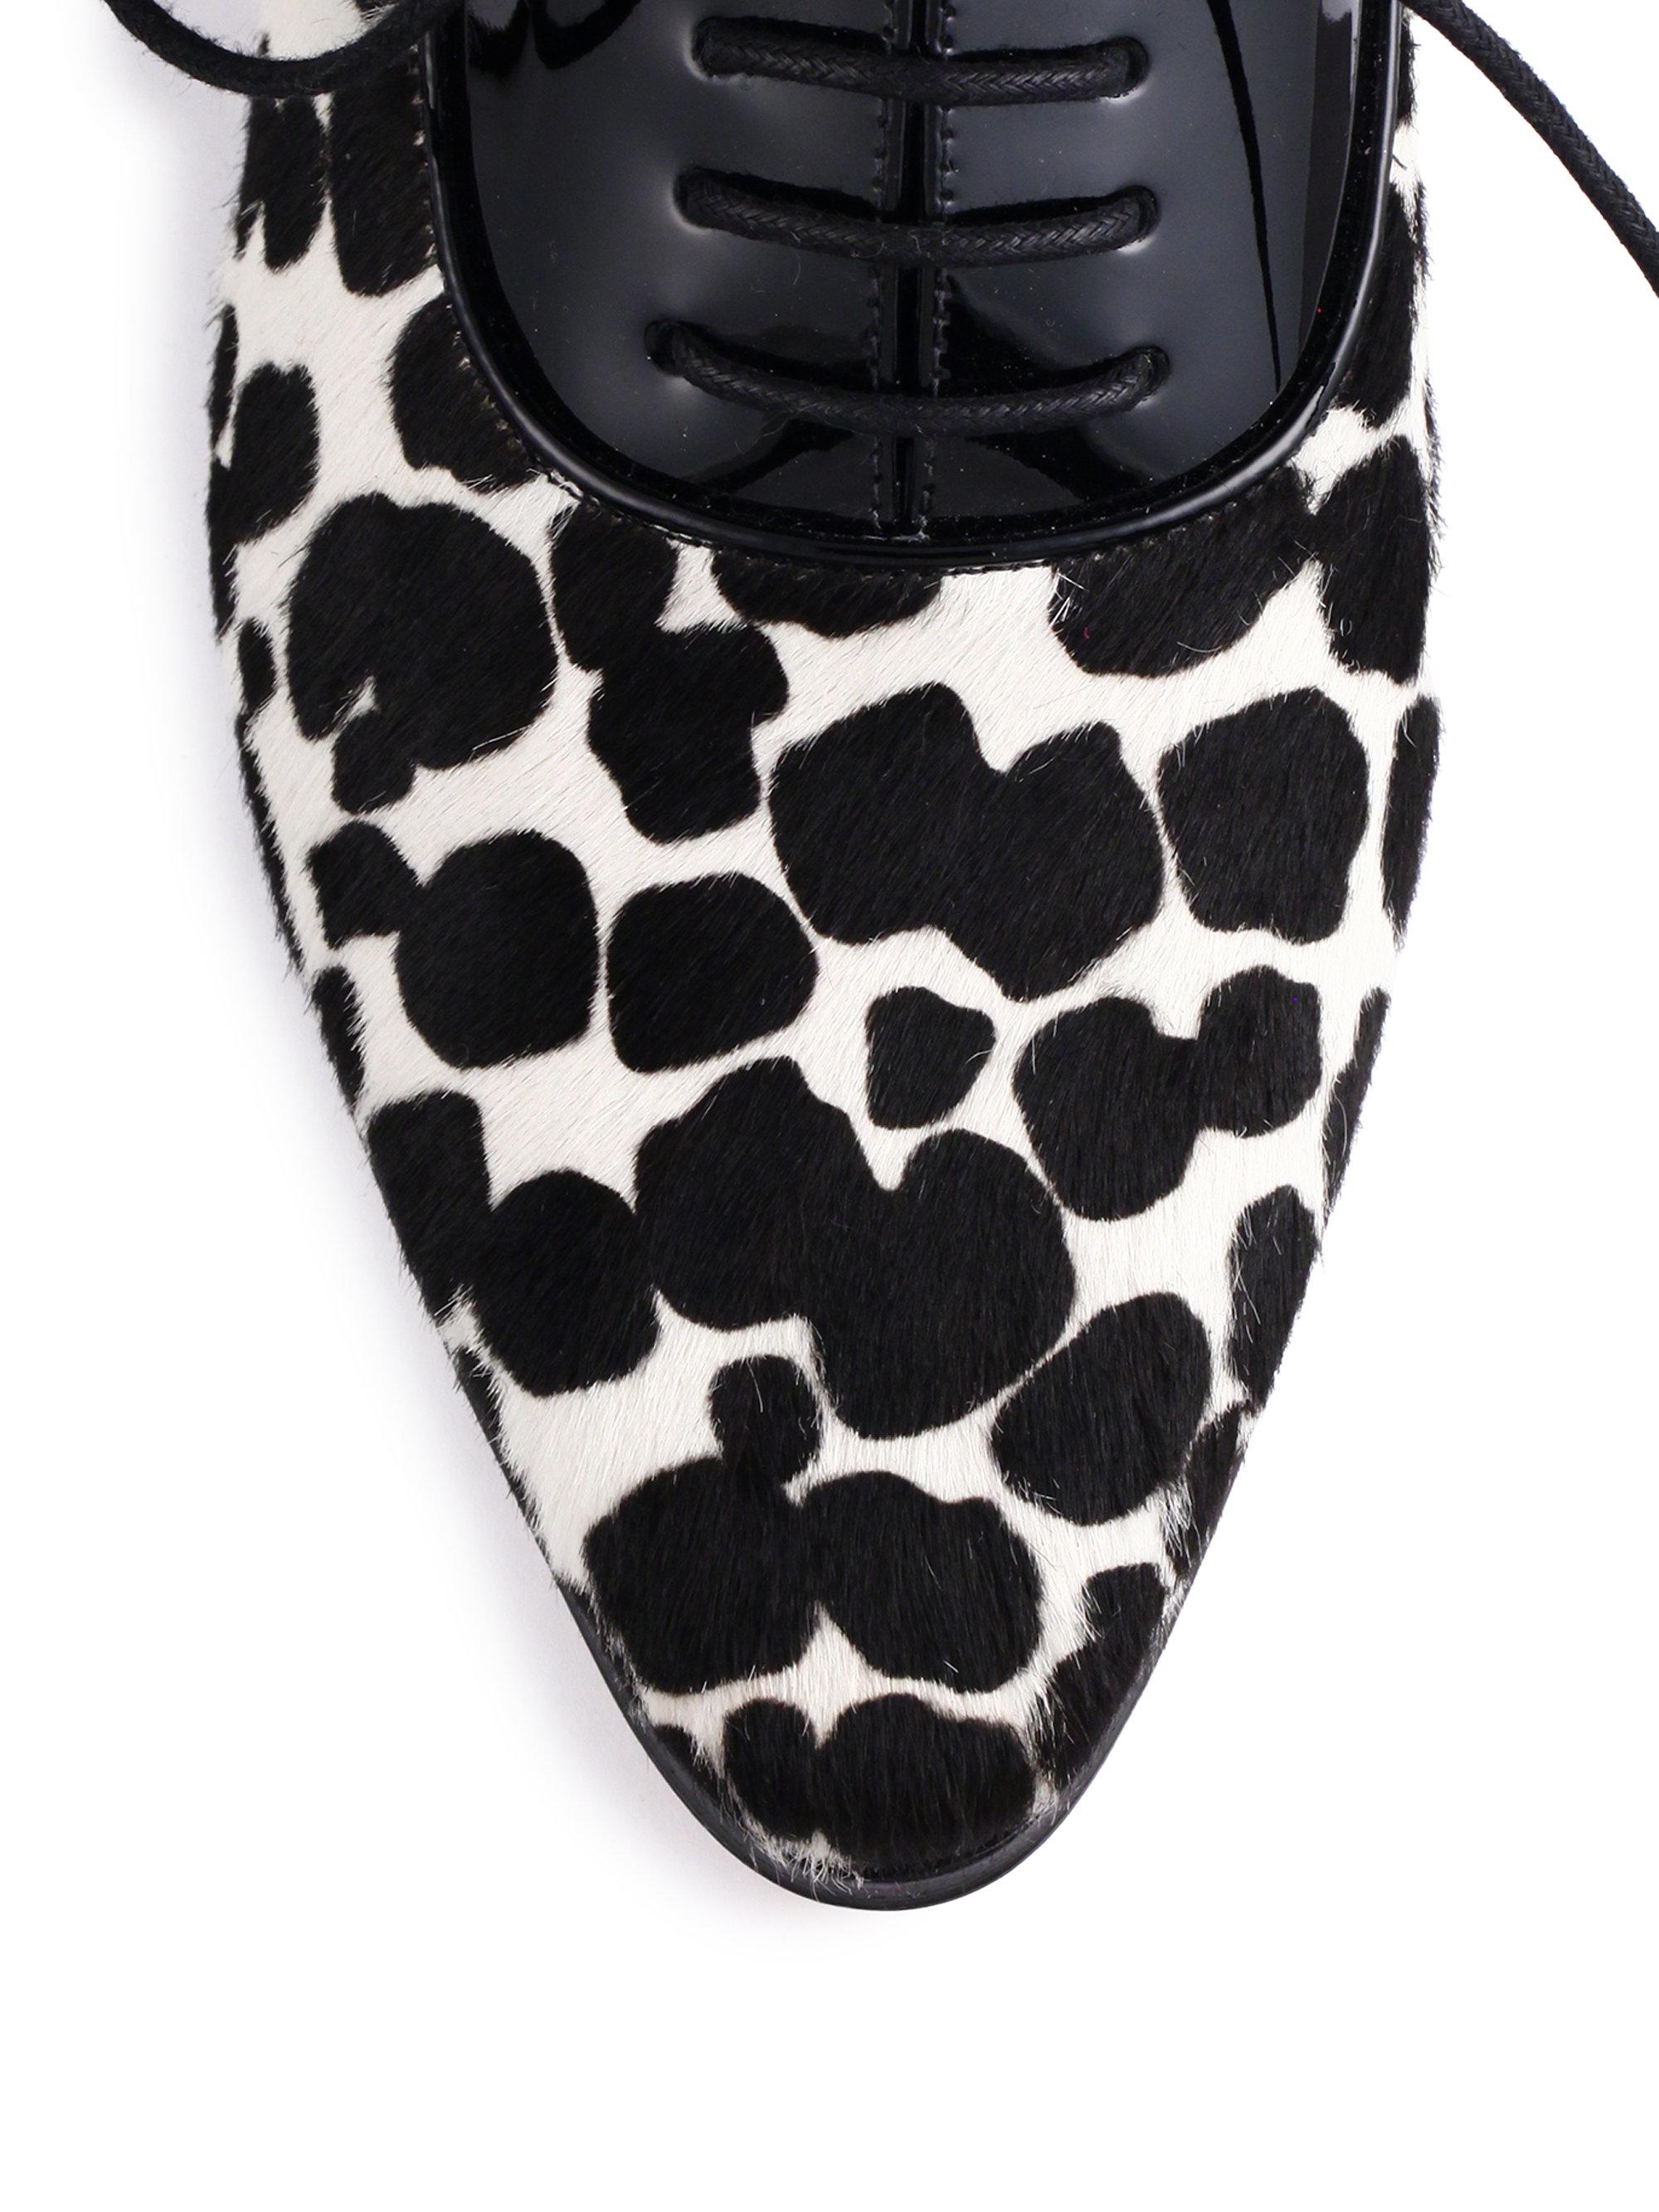 Michael Kors Lottie Cheetah Print Calf Hair Amp Patent